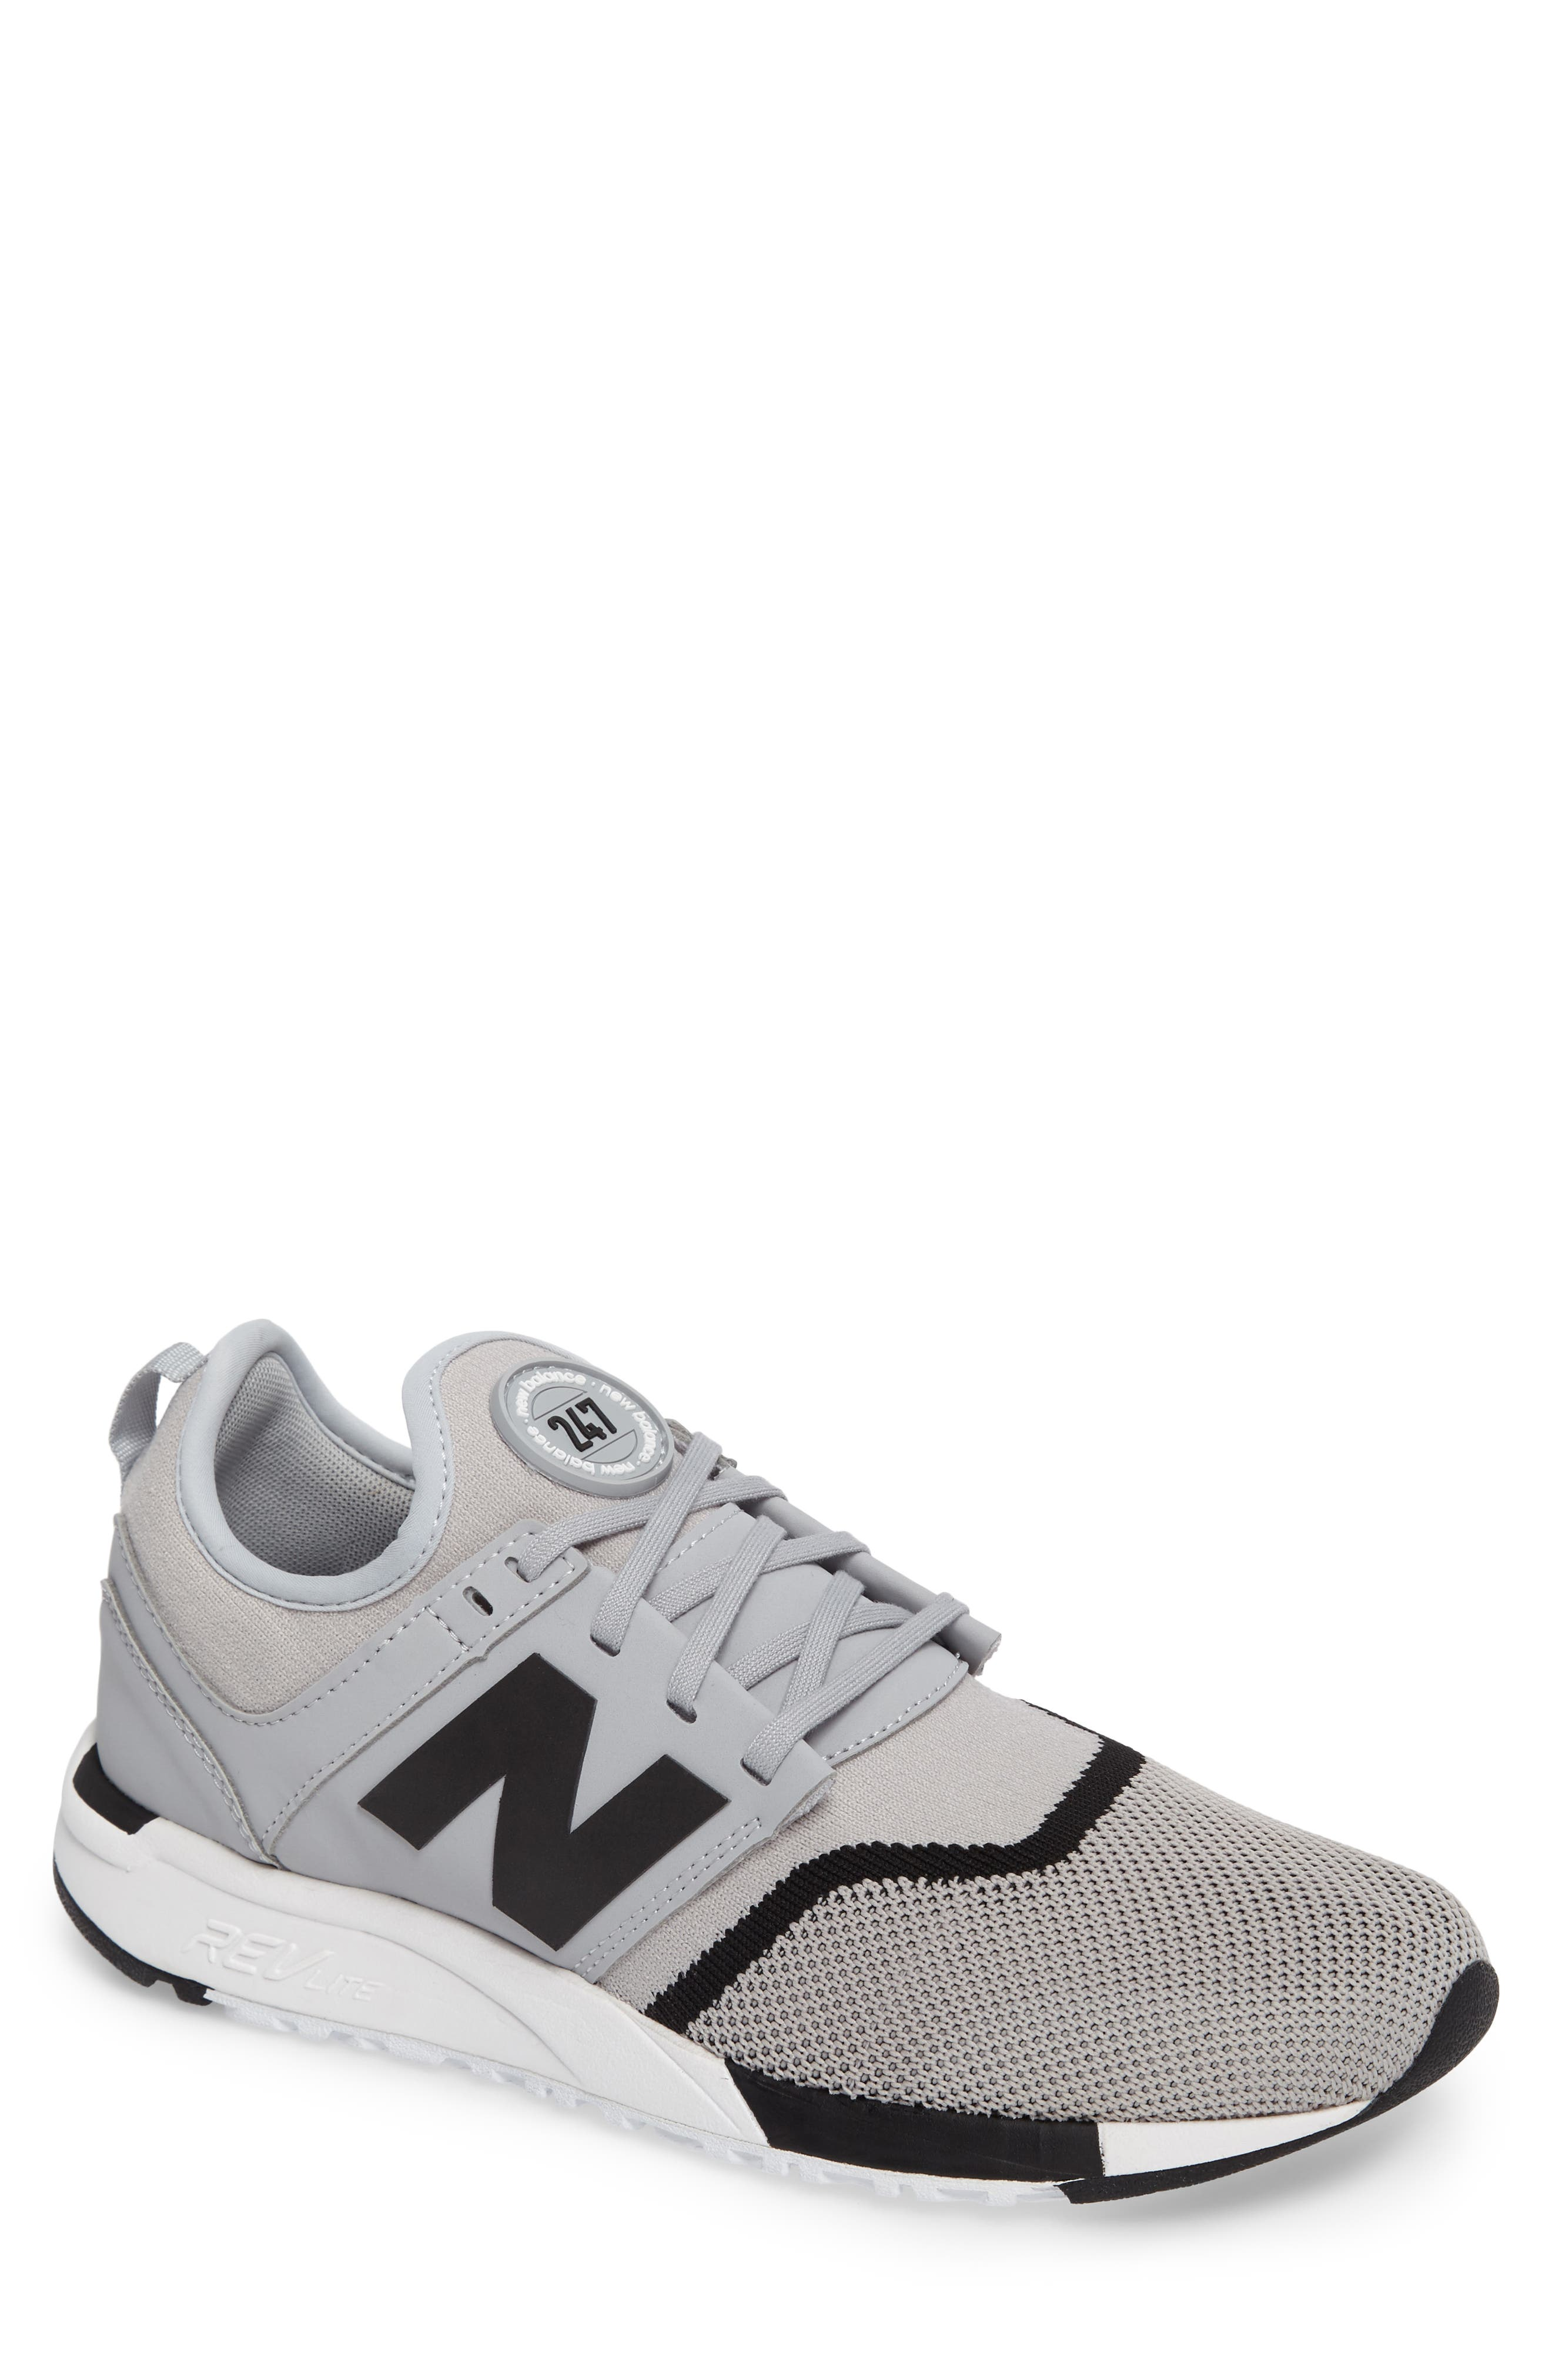 Alternate Image 1 Selected - New Balance 247 Sport Knit Sneaker (Men)